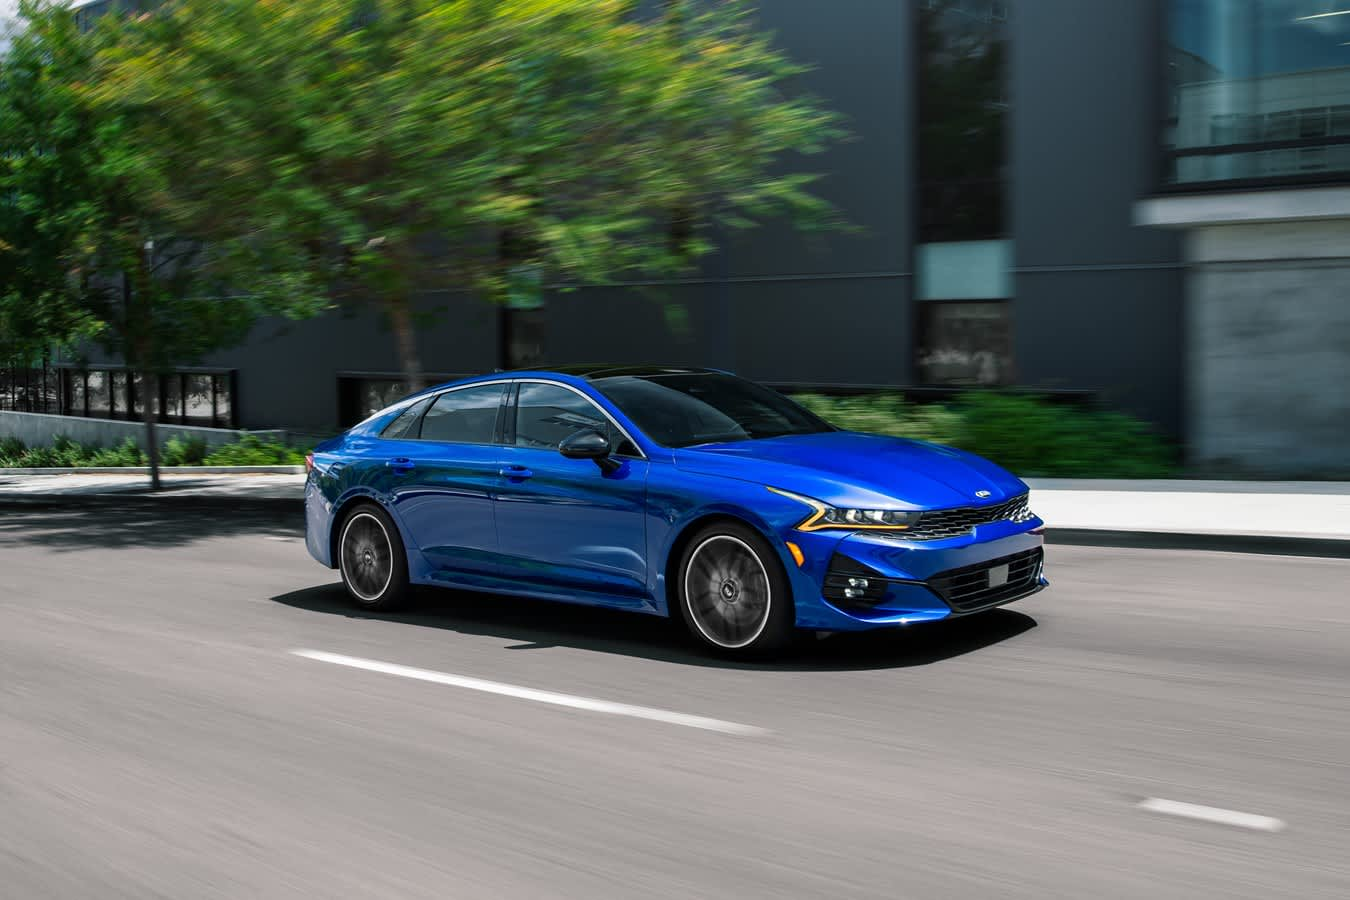 Kia unveils new K5 sedan in attempt to halt skidding sales